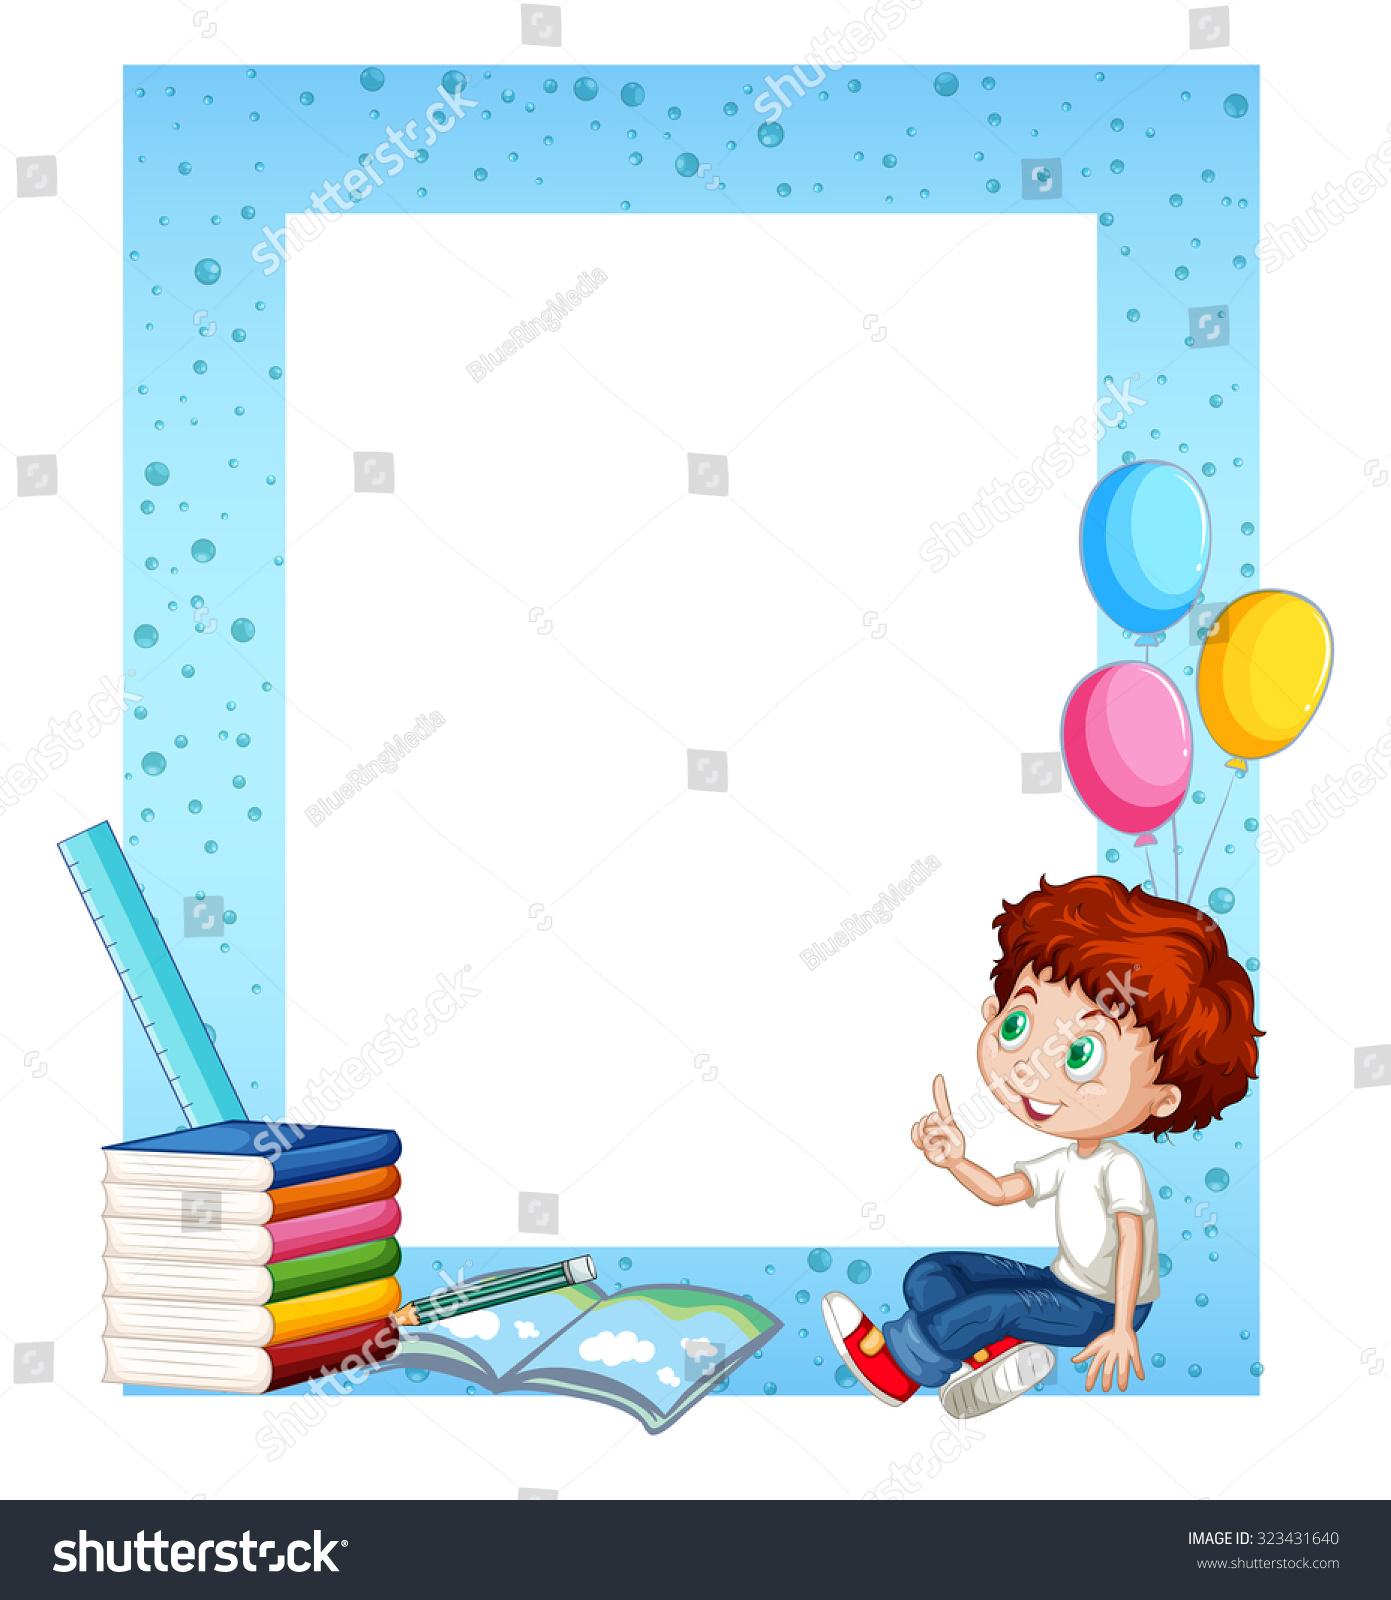 Little Boys Toys Border : Little boy and books around border illustration